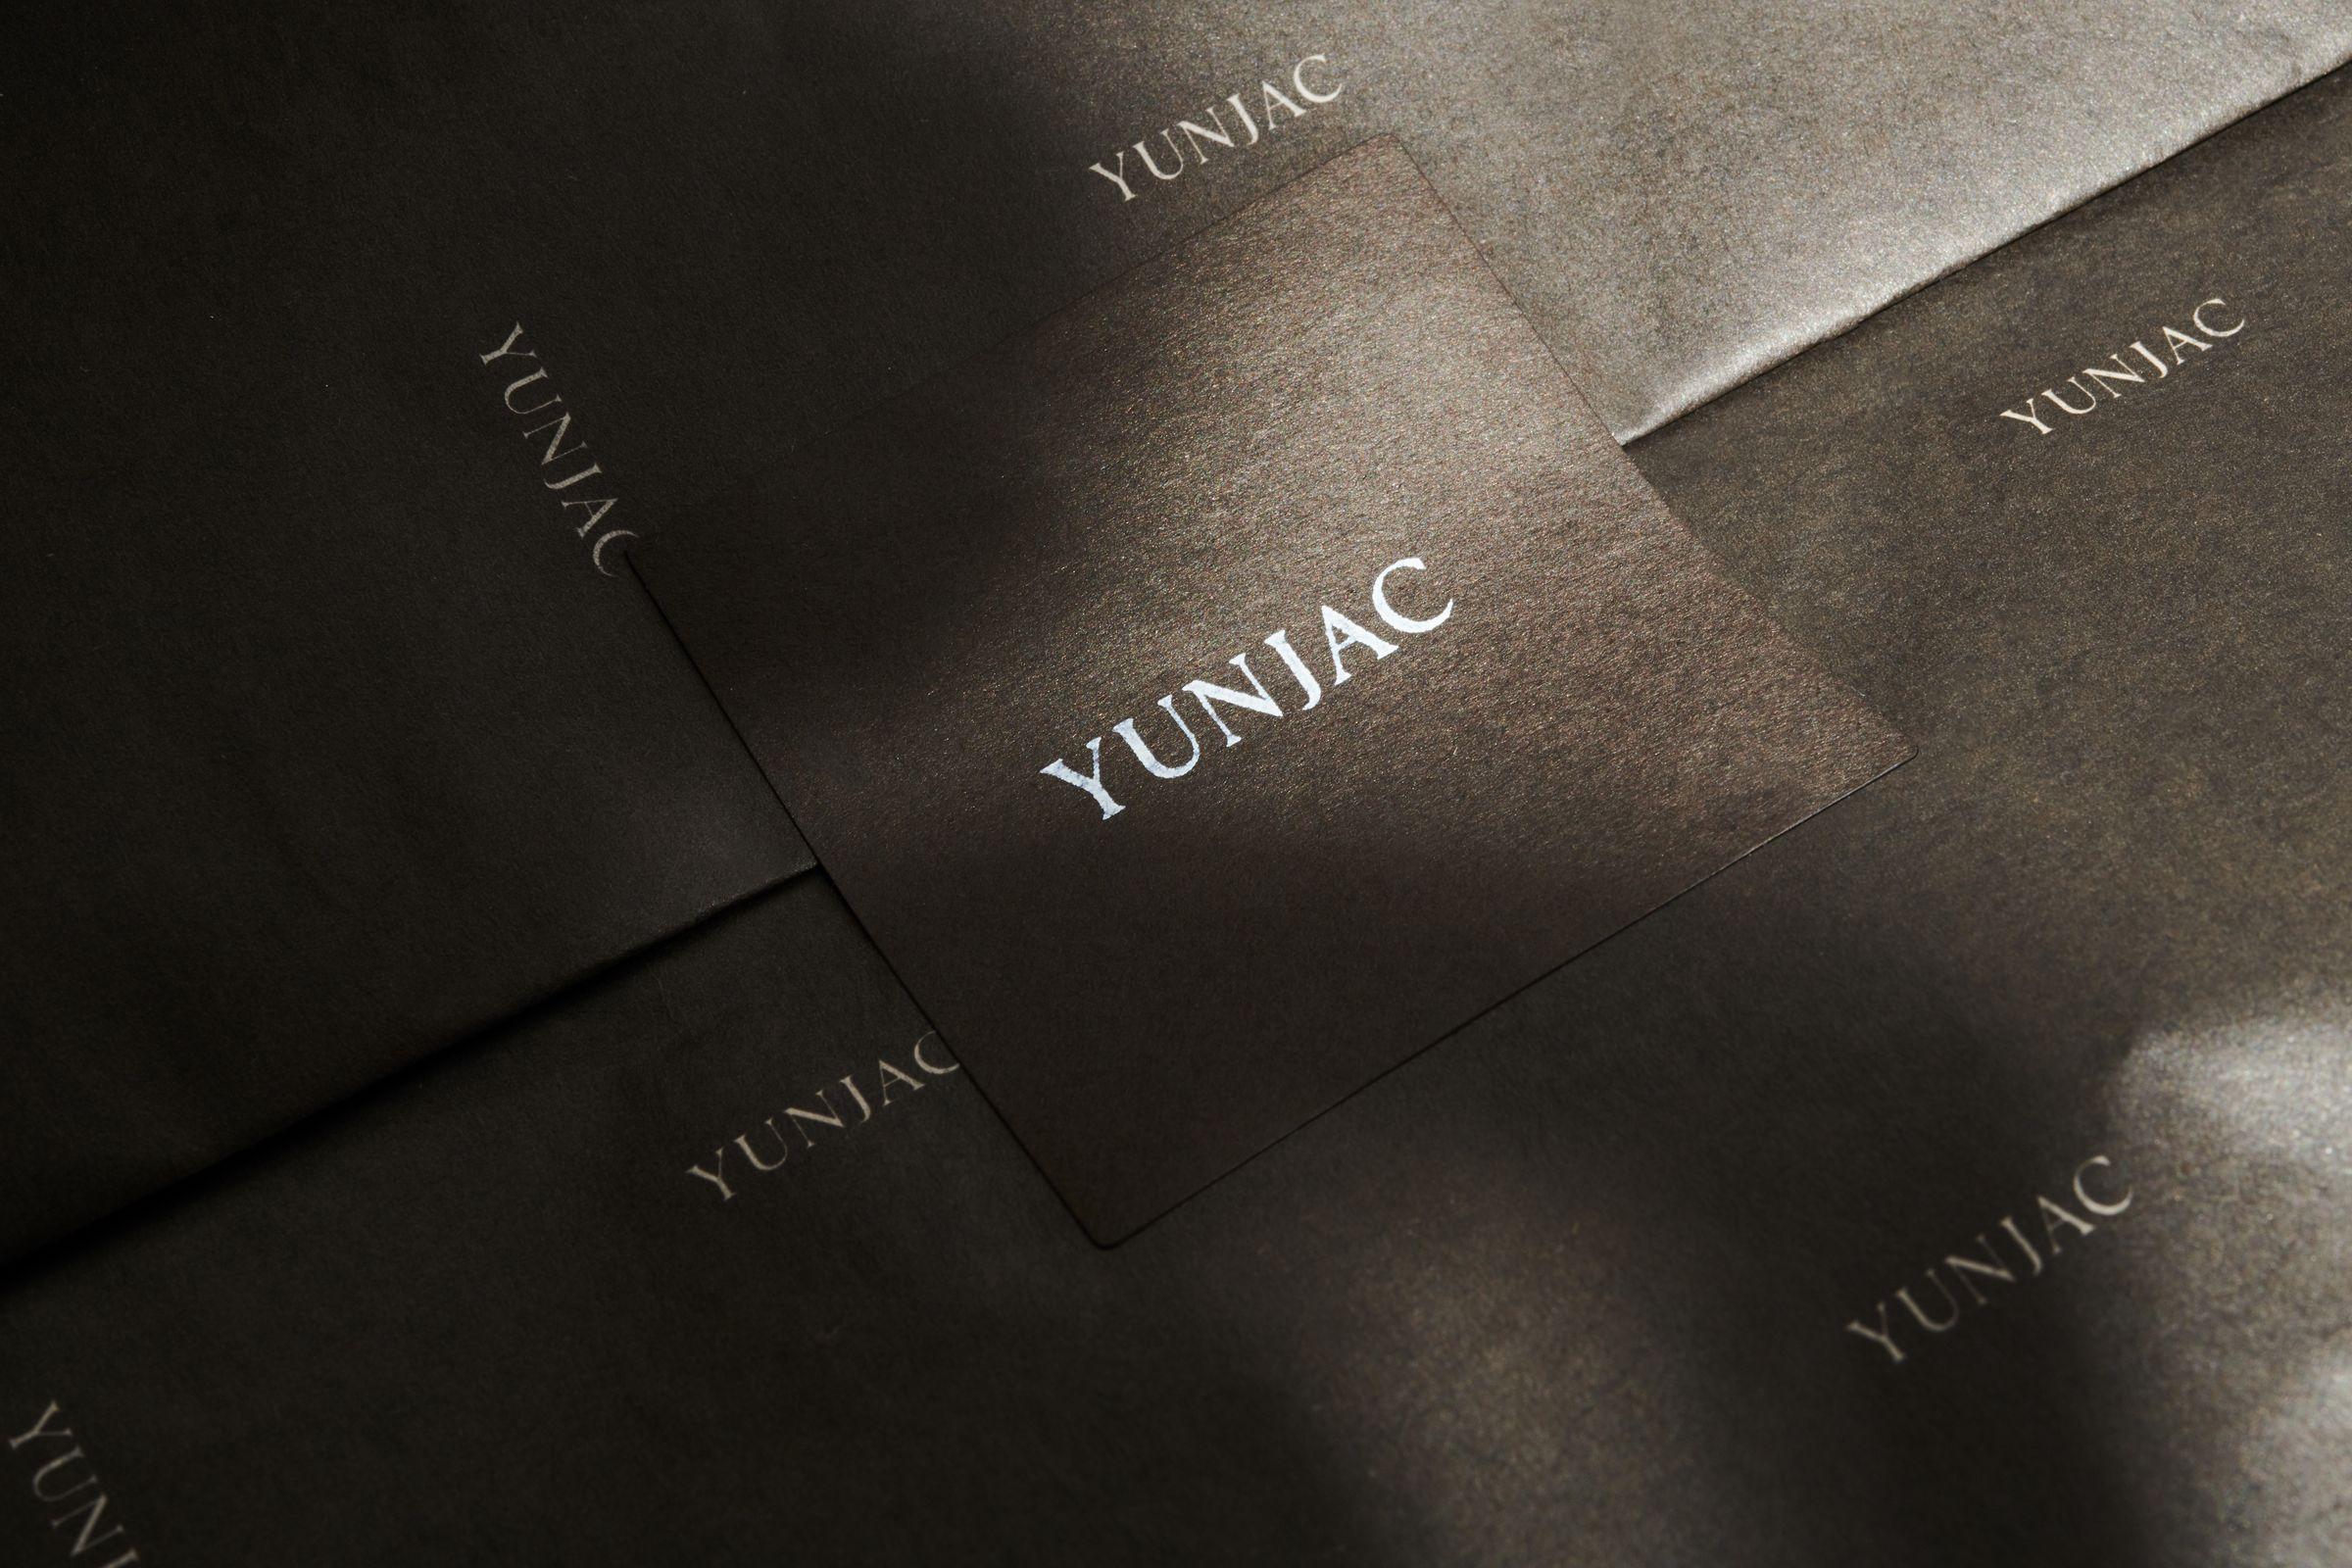 Yunjac logo on packaging